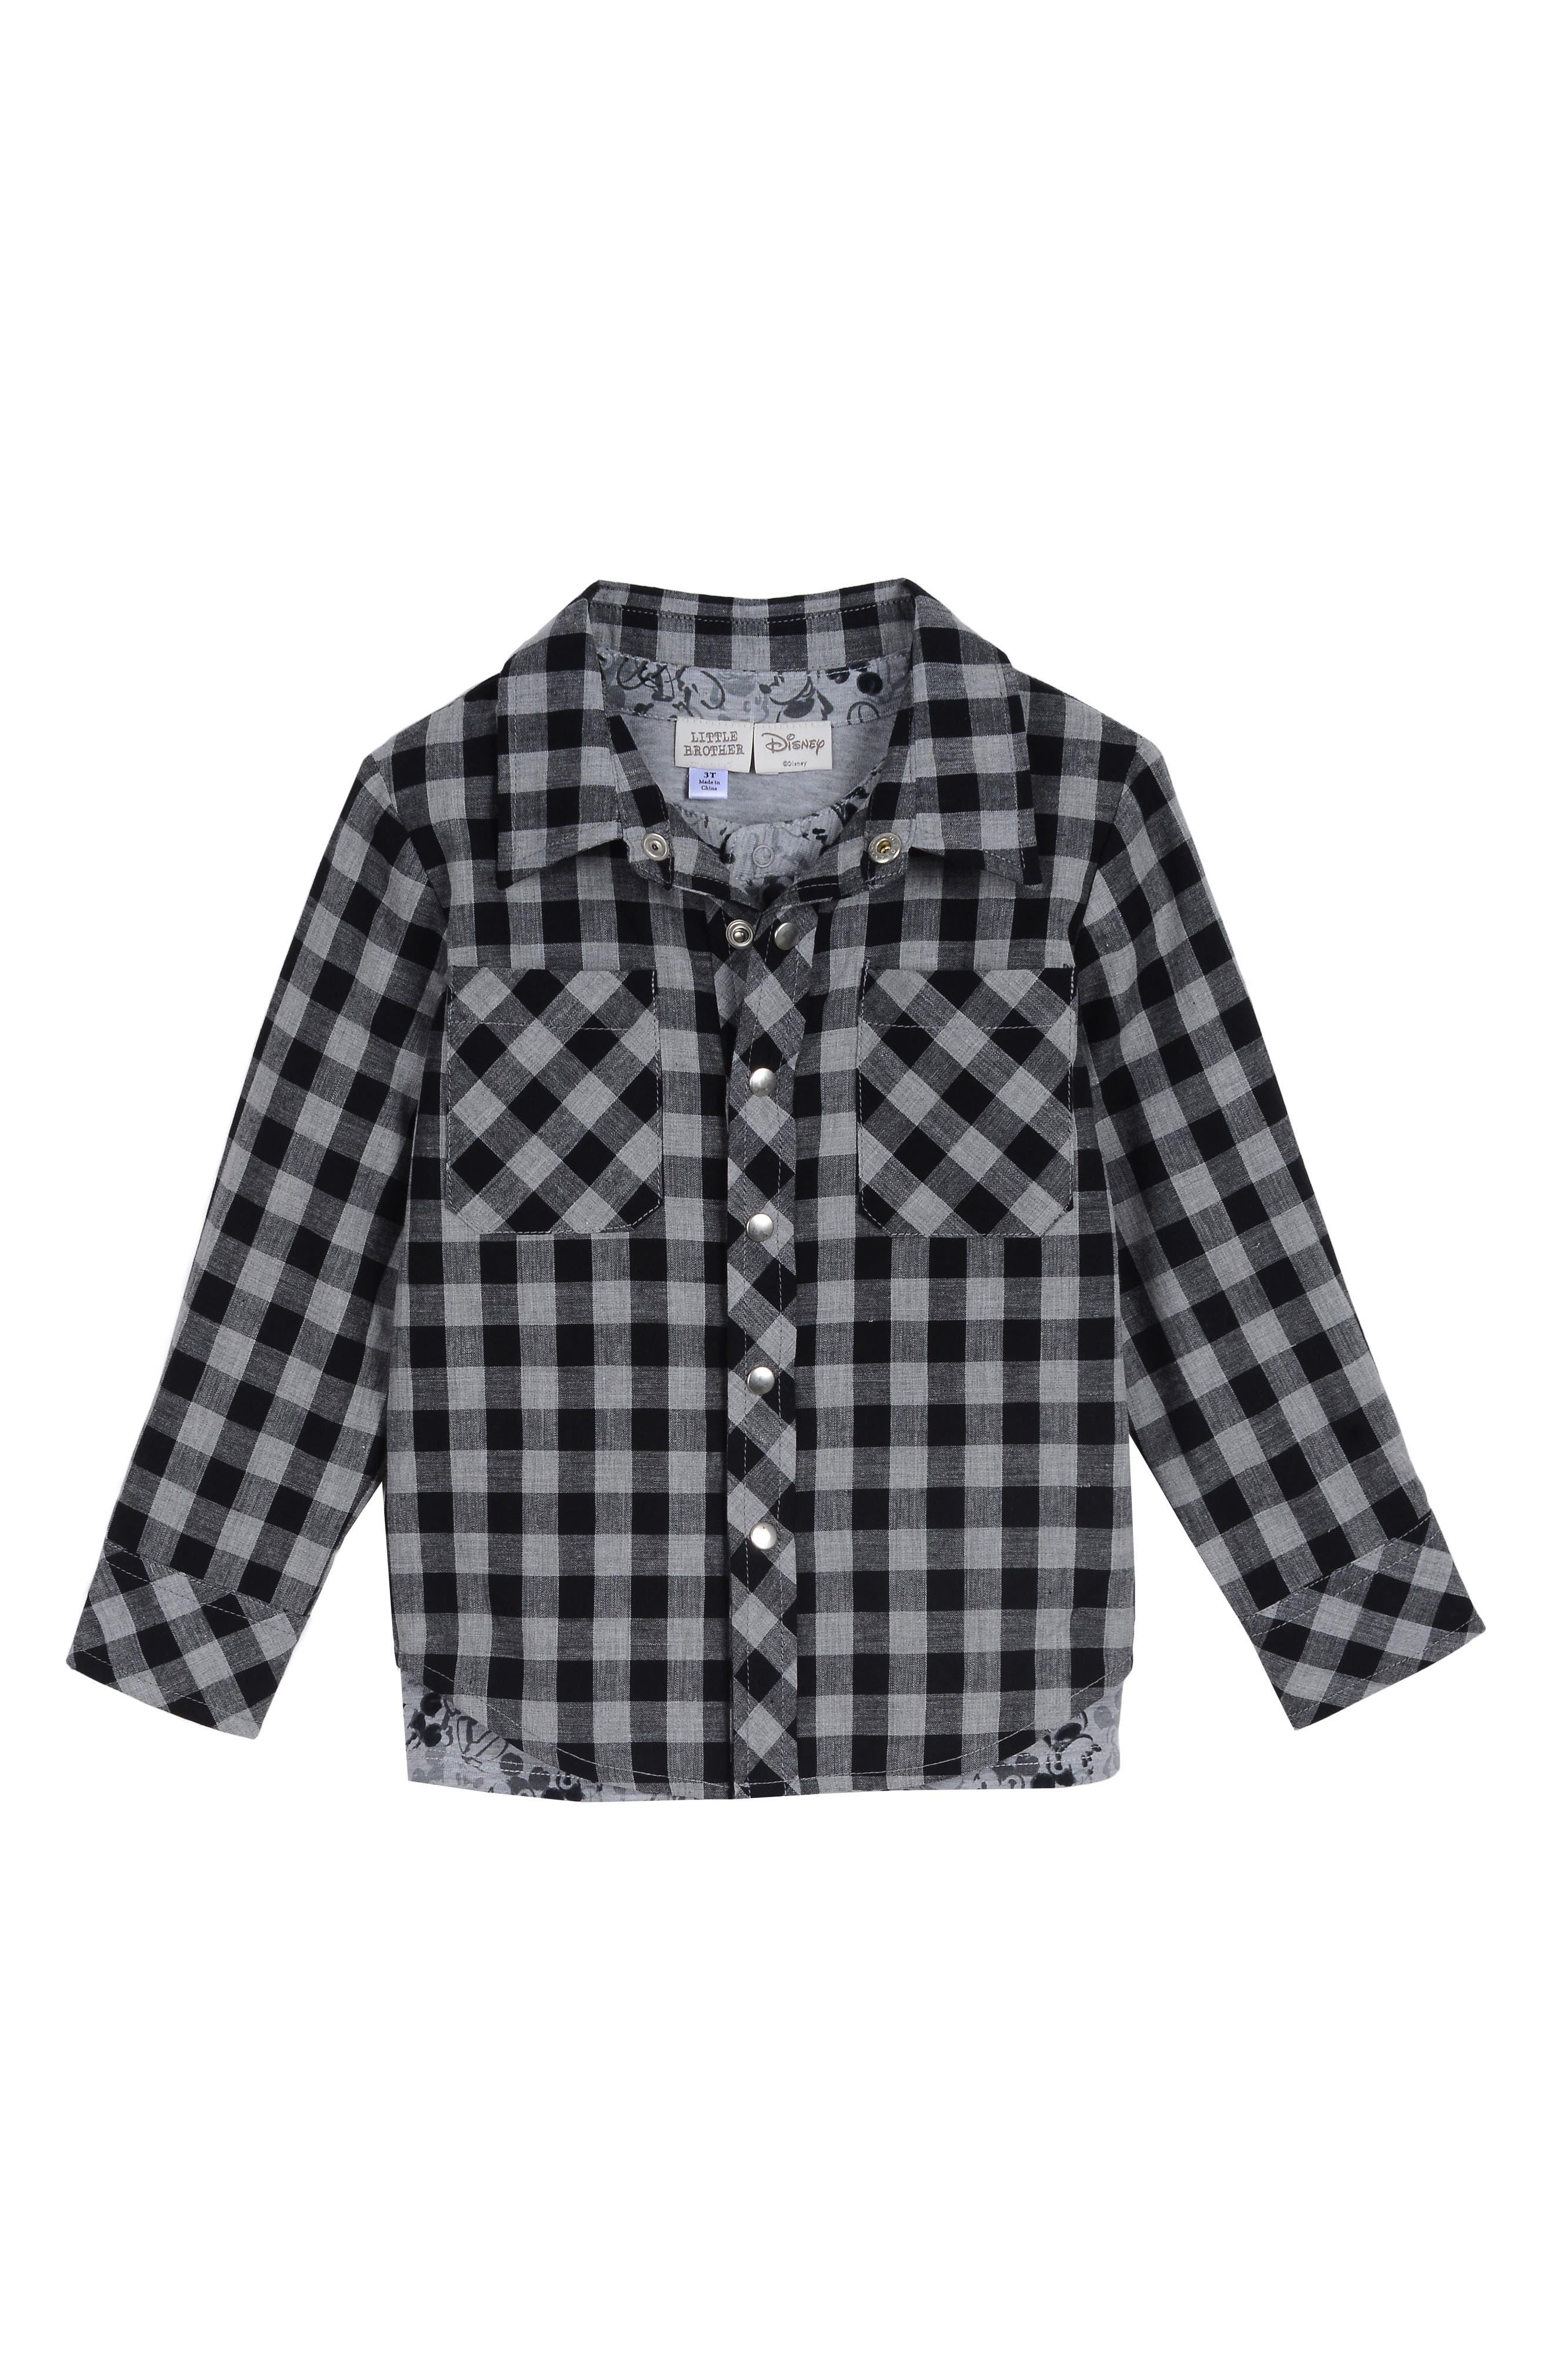 x Disney Plaid Shirt, T-Shirt & Pants Set,                             Alternate thumbnail 4, color,                             BLACK / GREY